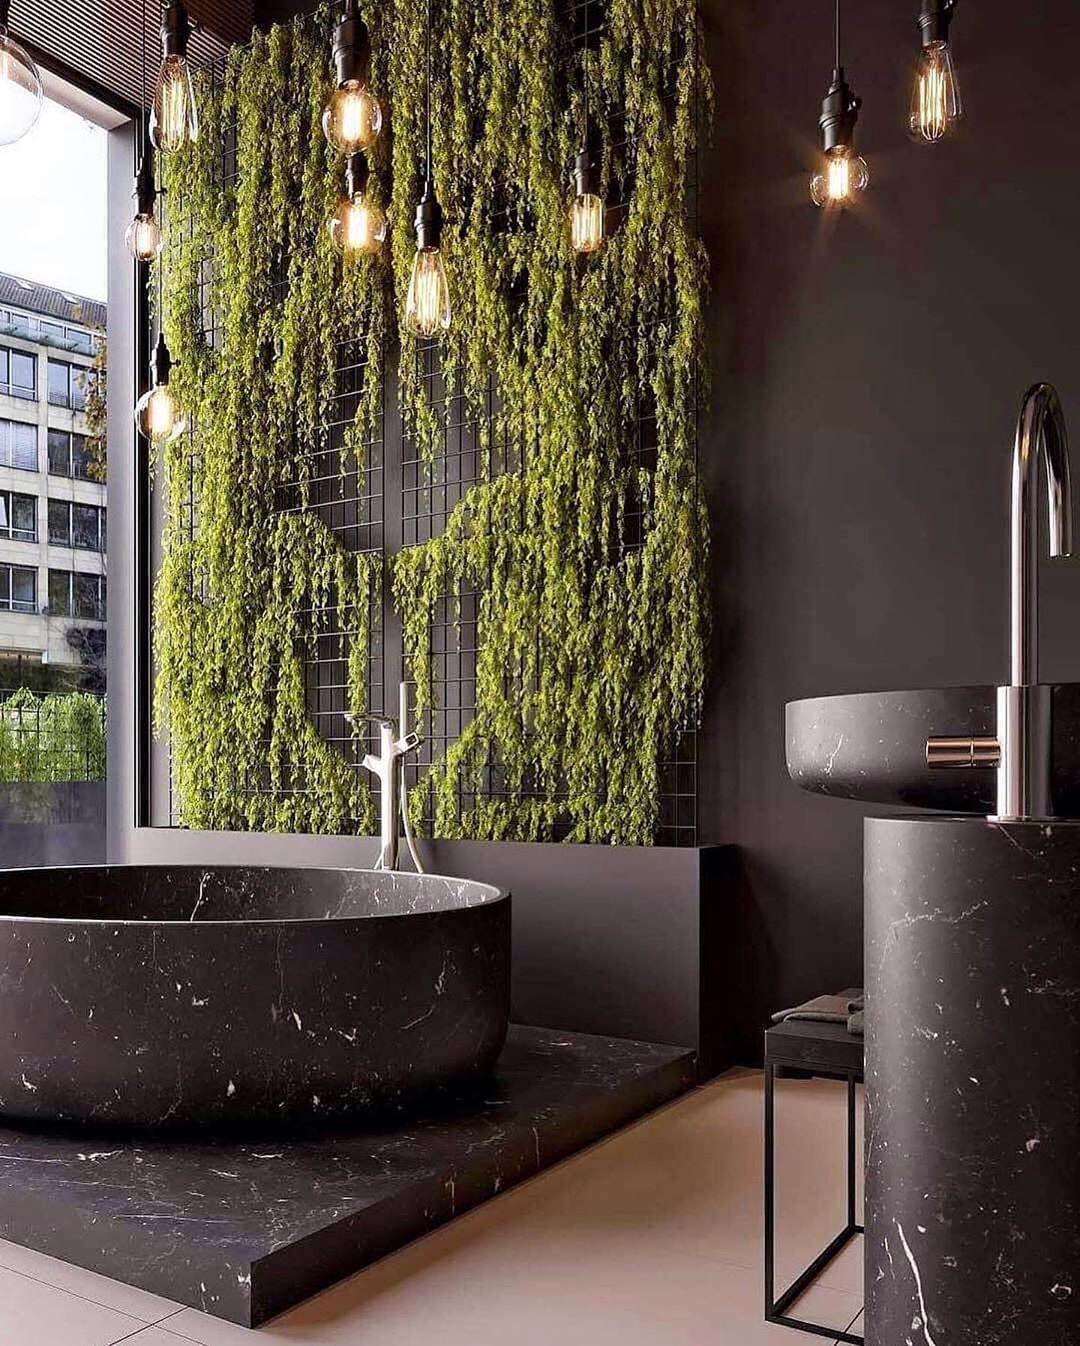 Loft On Instagram Extraordinary Black Marble Bathtub With An